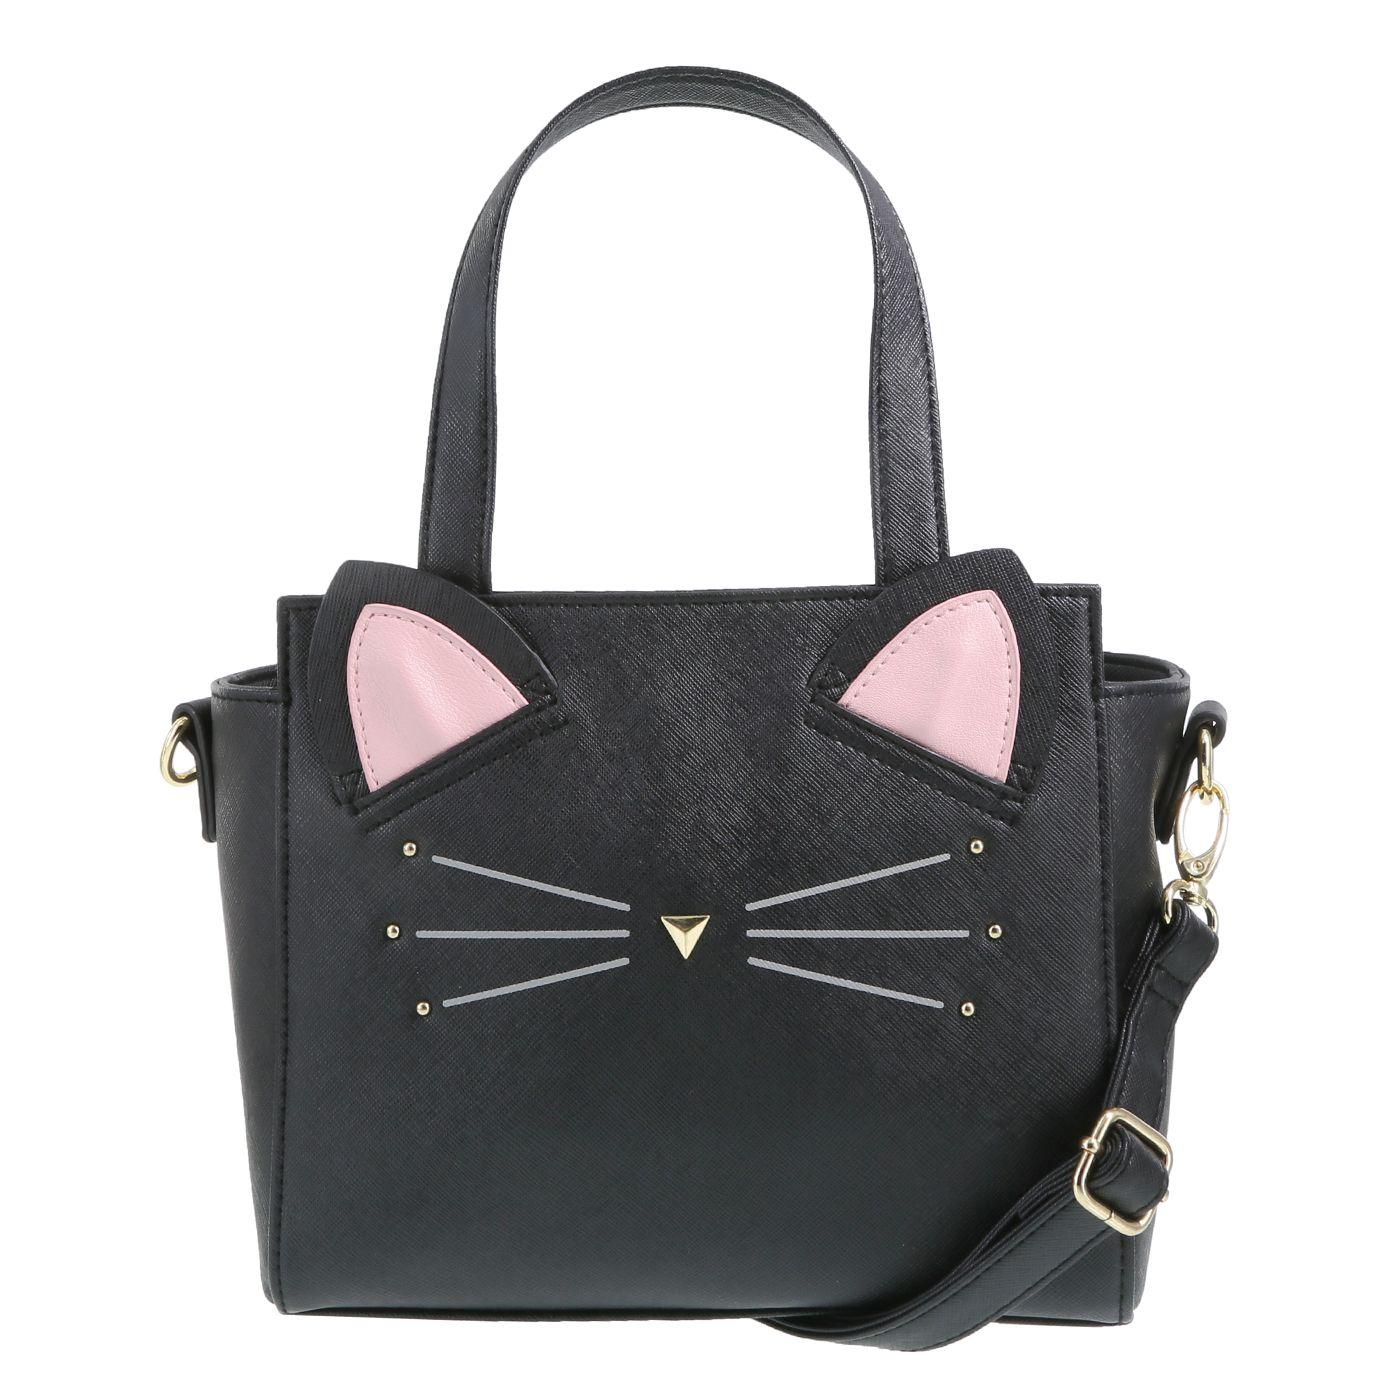 35e5378c918 Payless Women's Kitty Kat Satchel Bag | Payless | Payless USA in ...